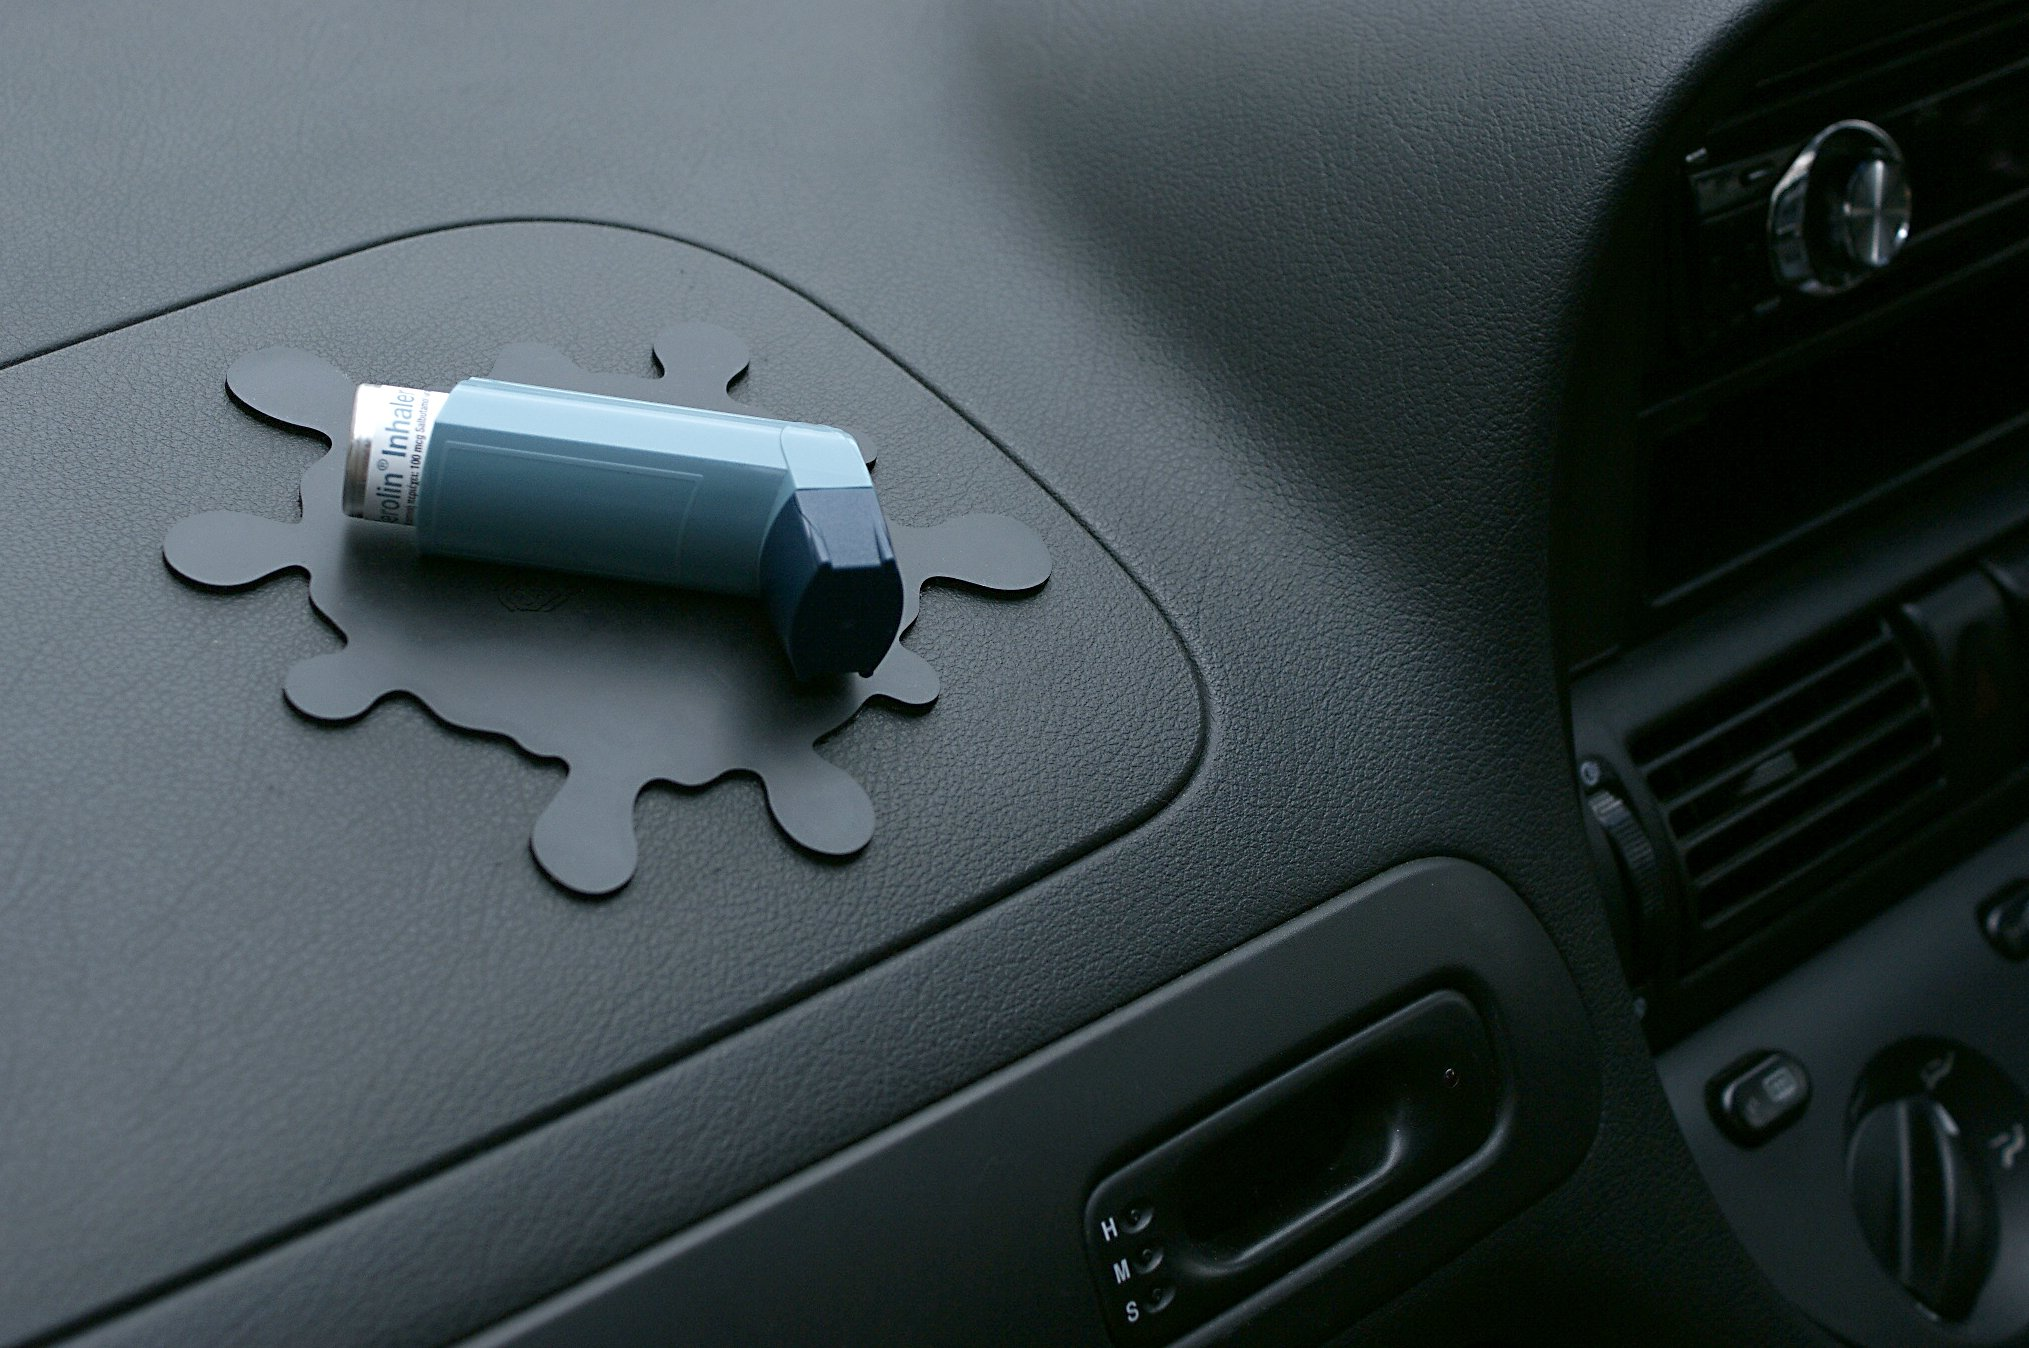 YiKaSin Small Anti-slip Silicone Car Dashboard Magic Sticky Pad Anti Slip Mat Car Dashboard Adhesive Mat for Glasses Keys 13 * 7cm Coins